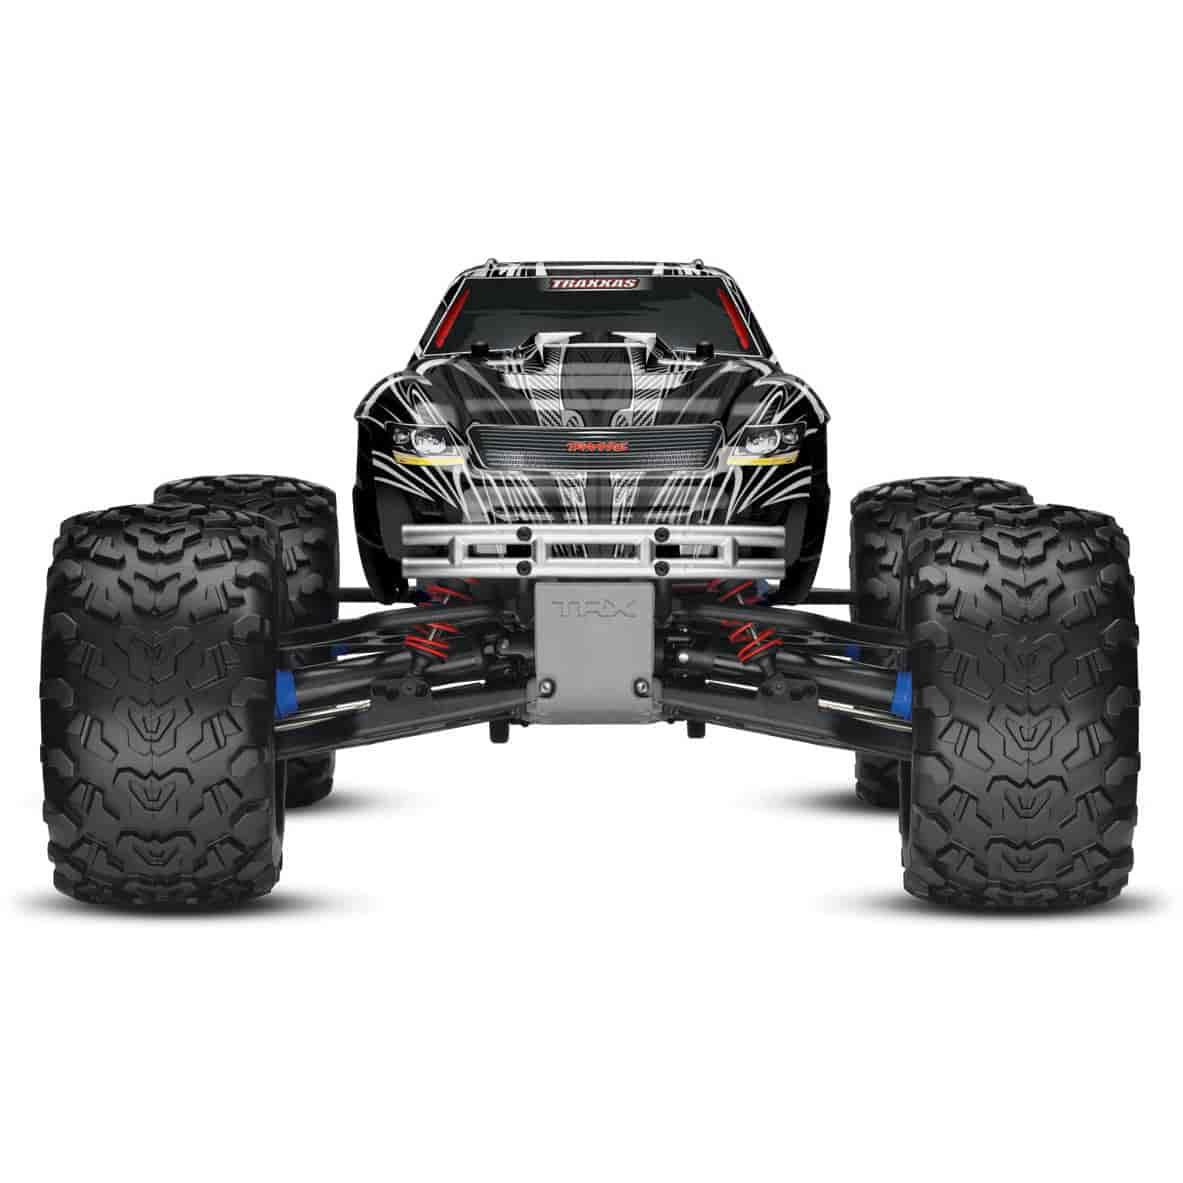 hight resolution of traxxas maxx 3 3 nitro 4wd rtr monster truck